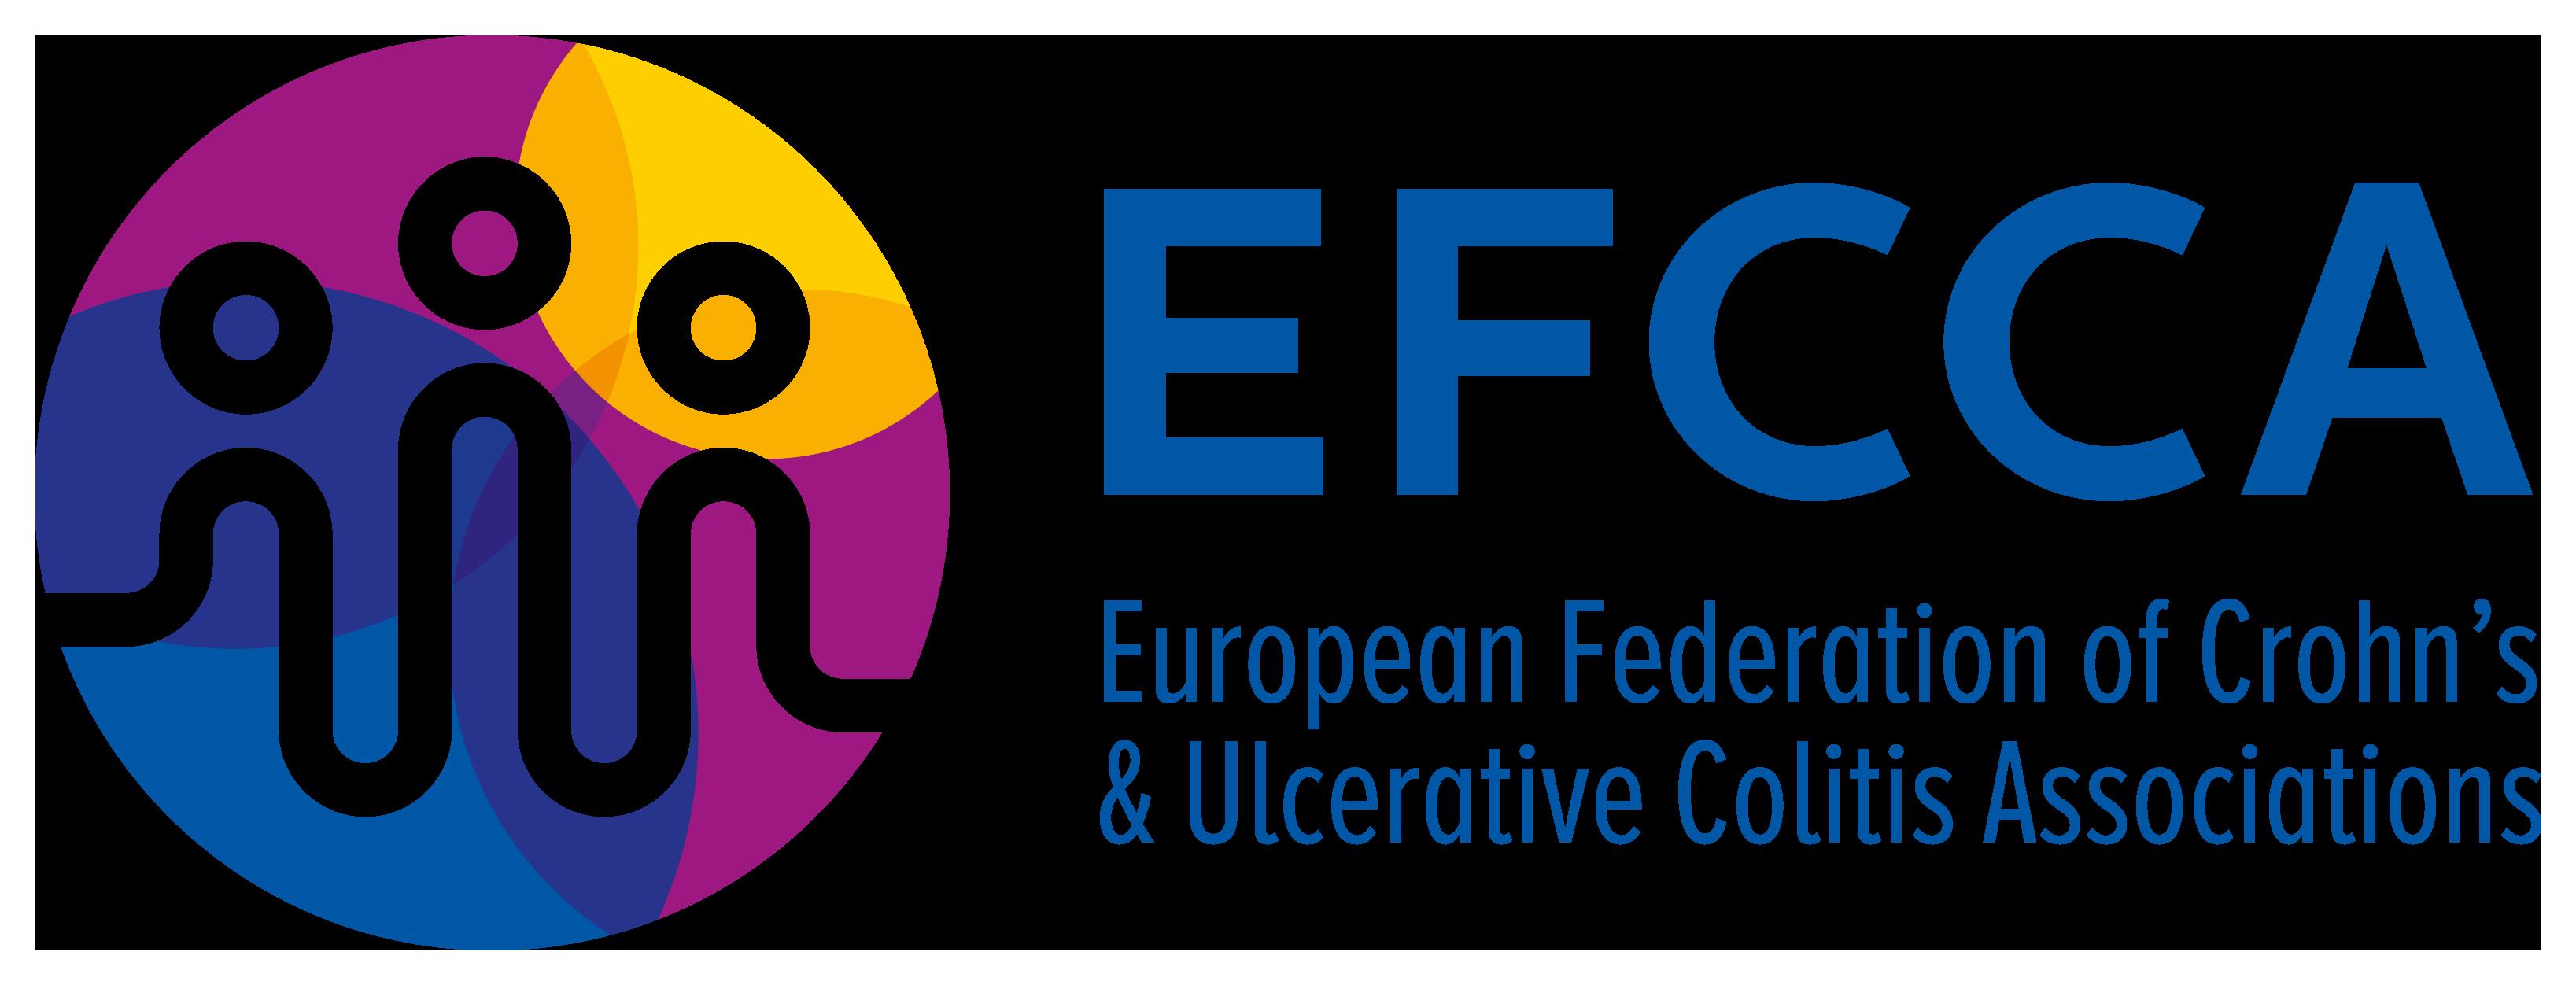 EFCCA - European Federation of Crohn's & Ulcerative Colitis Association